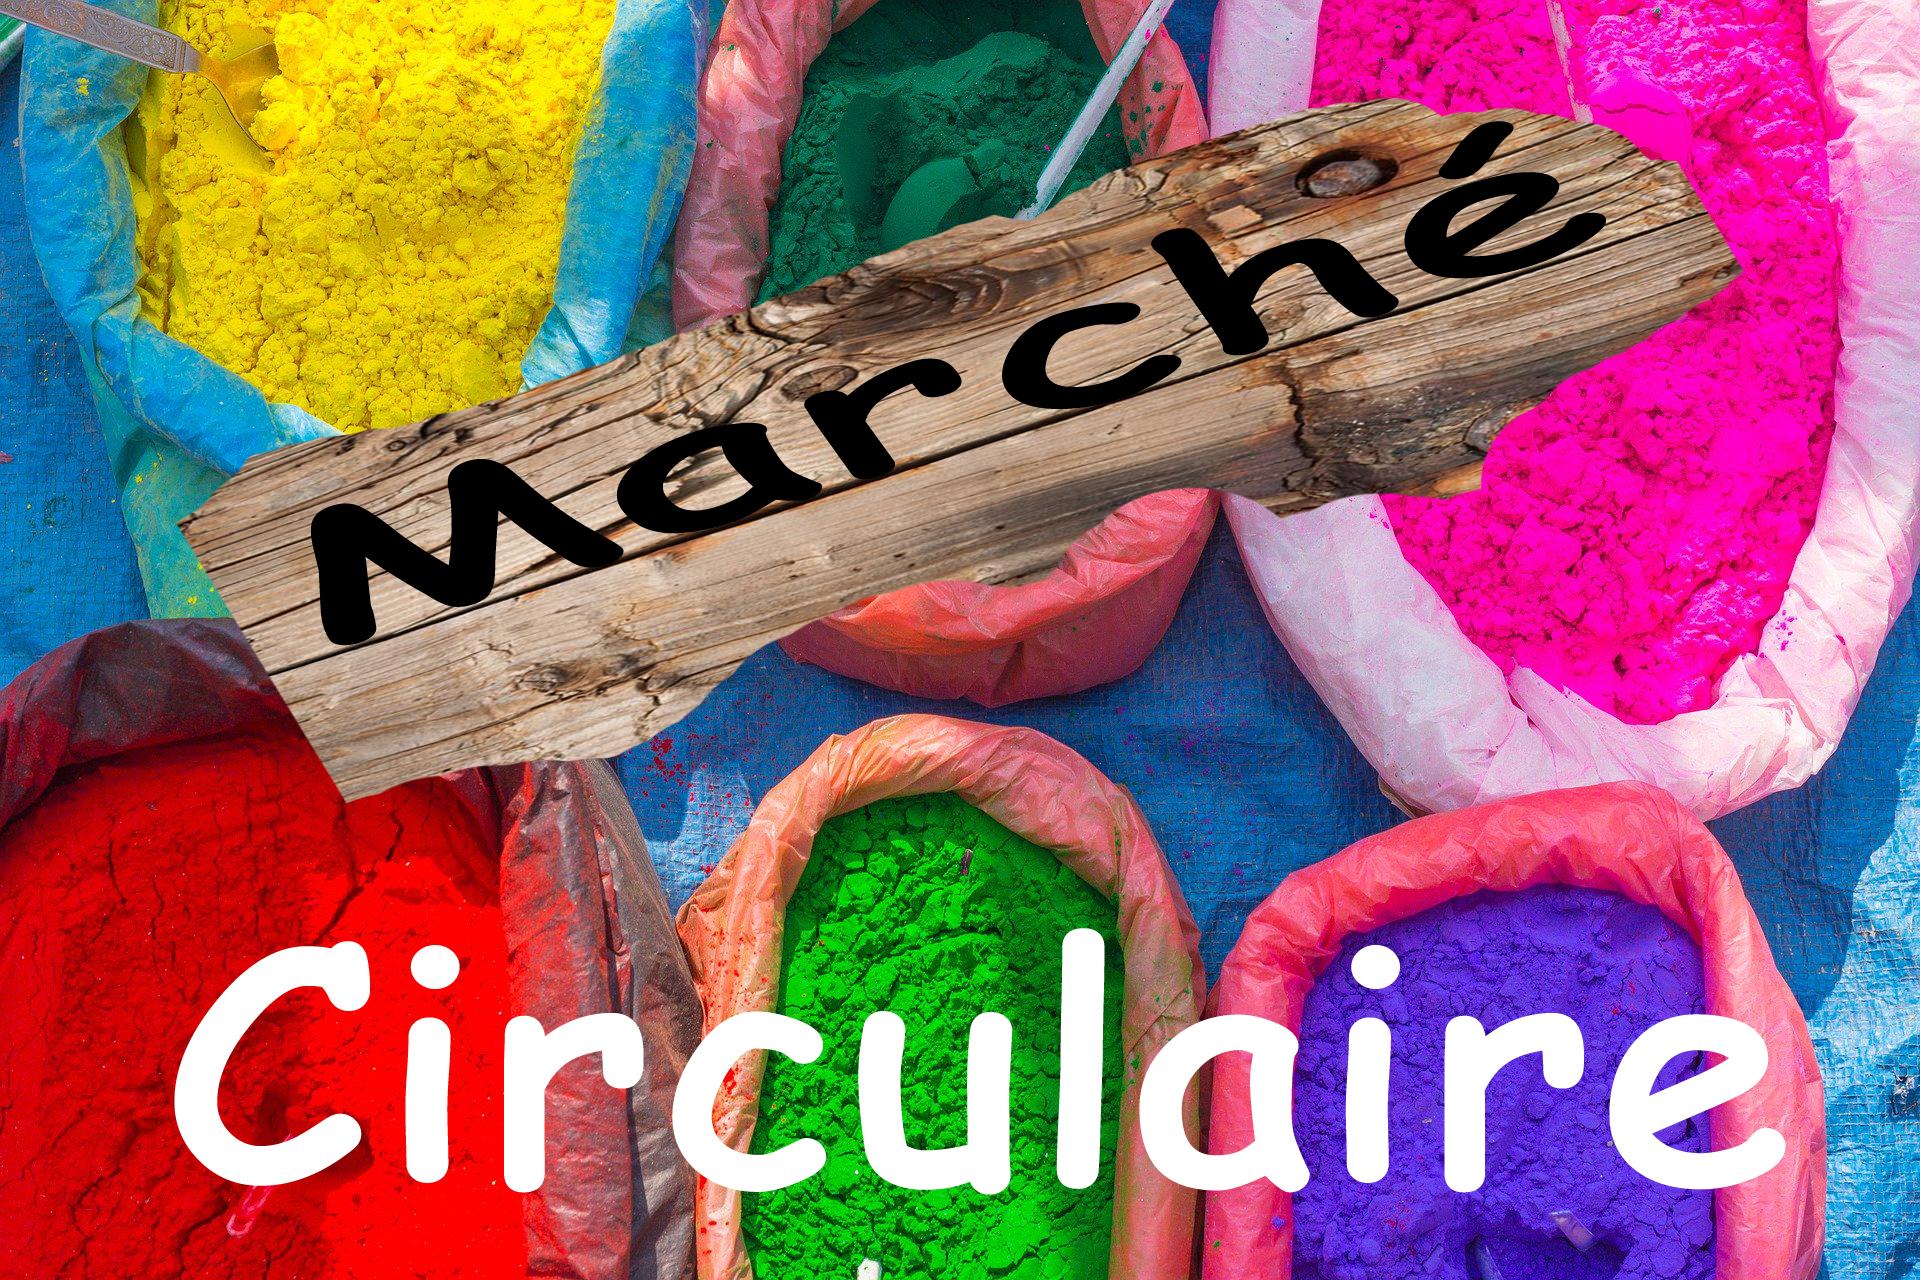 marché circulaire